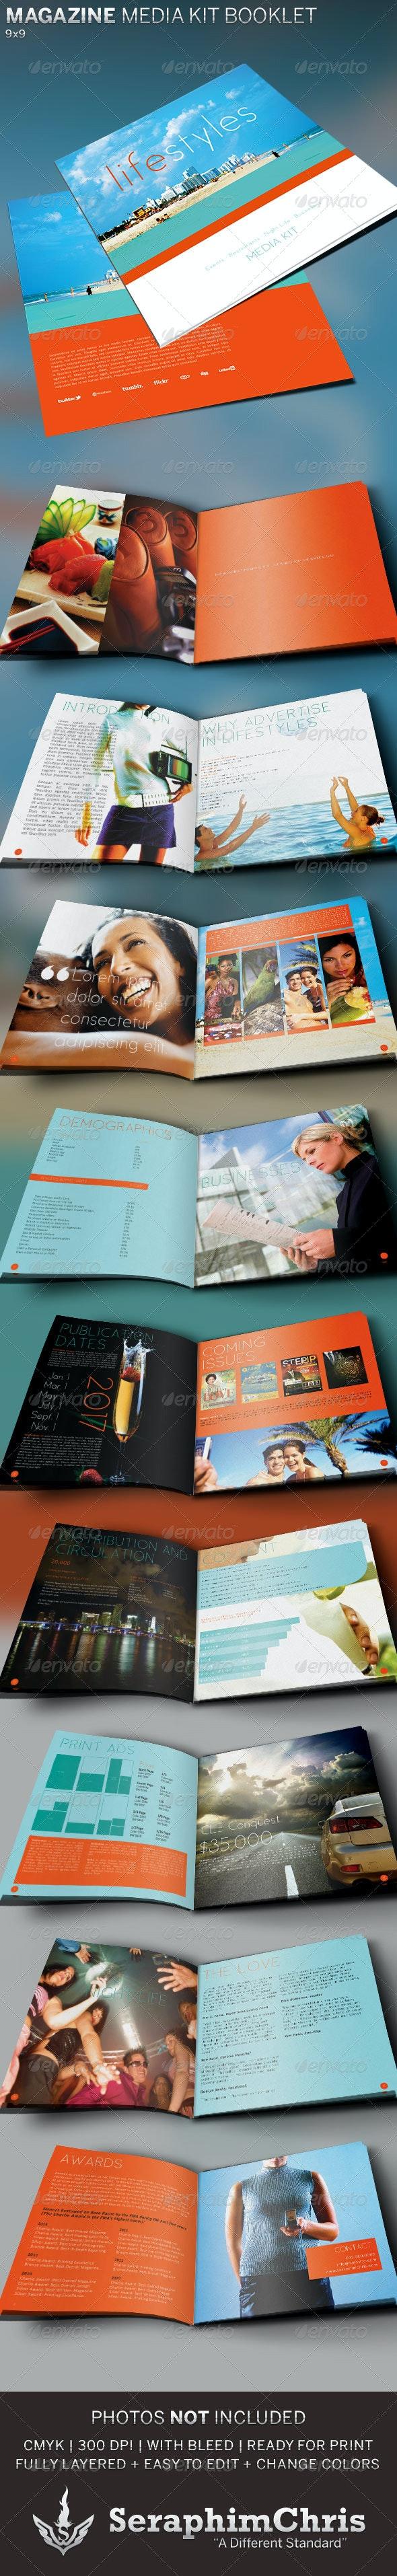 Magazine Media Kit Booklet Template - Corporate Brochures